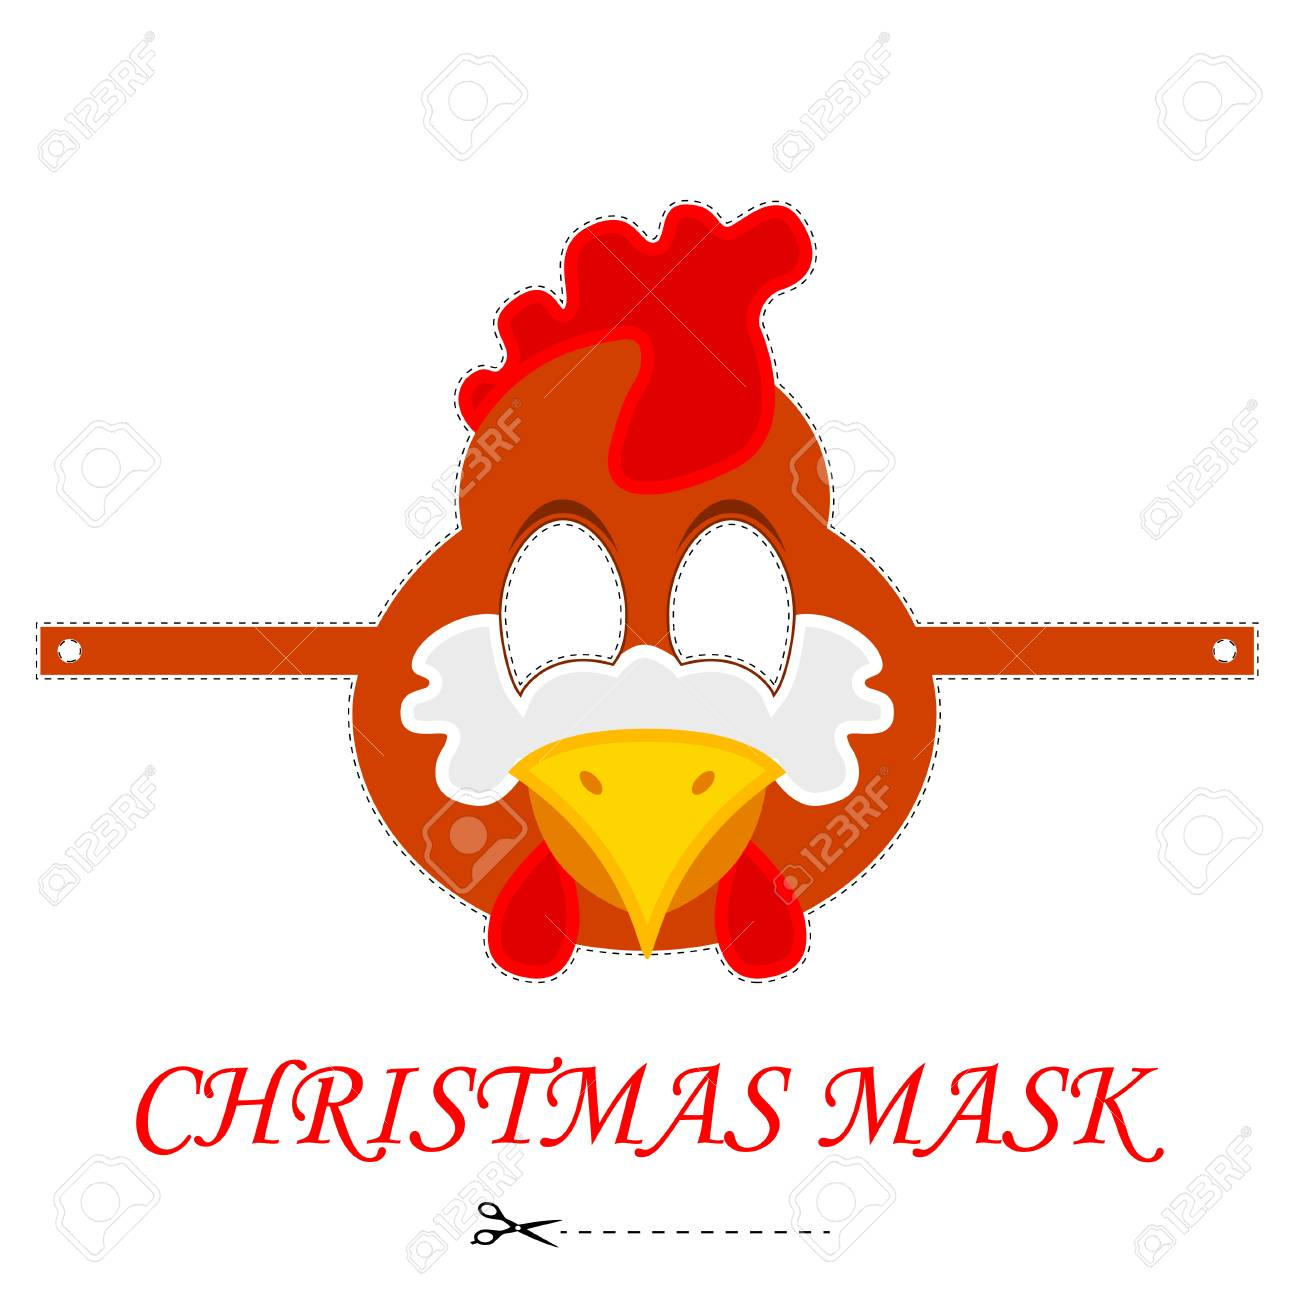 Vector De Dibujos Animados Gallo Máscara. Cock Plantilla De Máscara ...